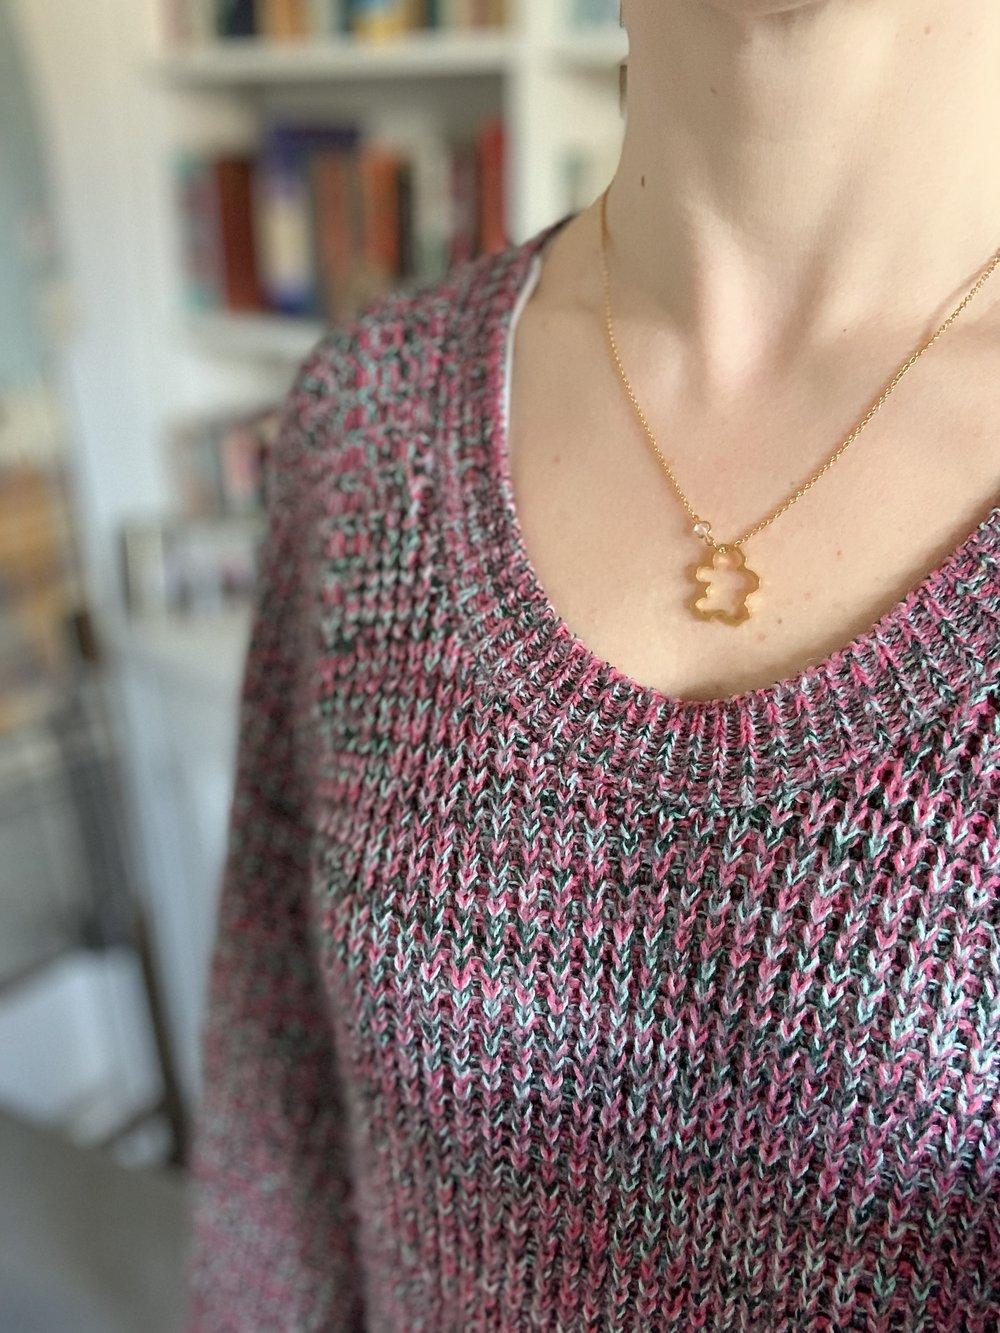 Jizo and Chibi necklace for fertility